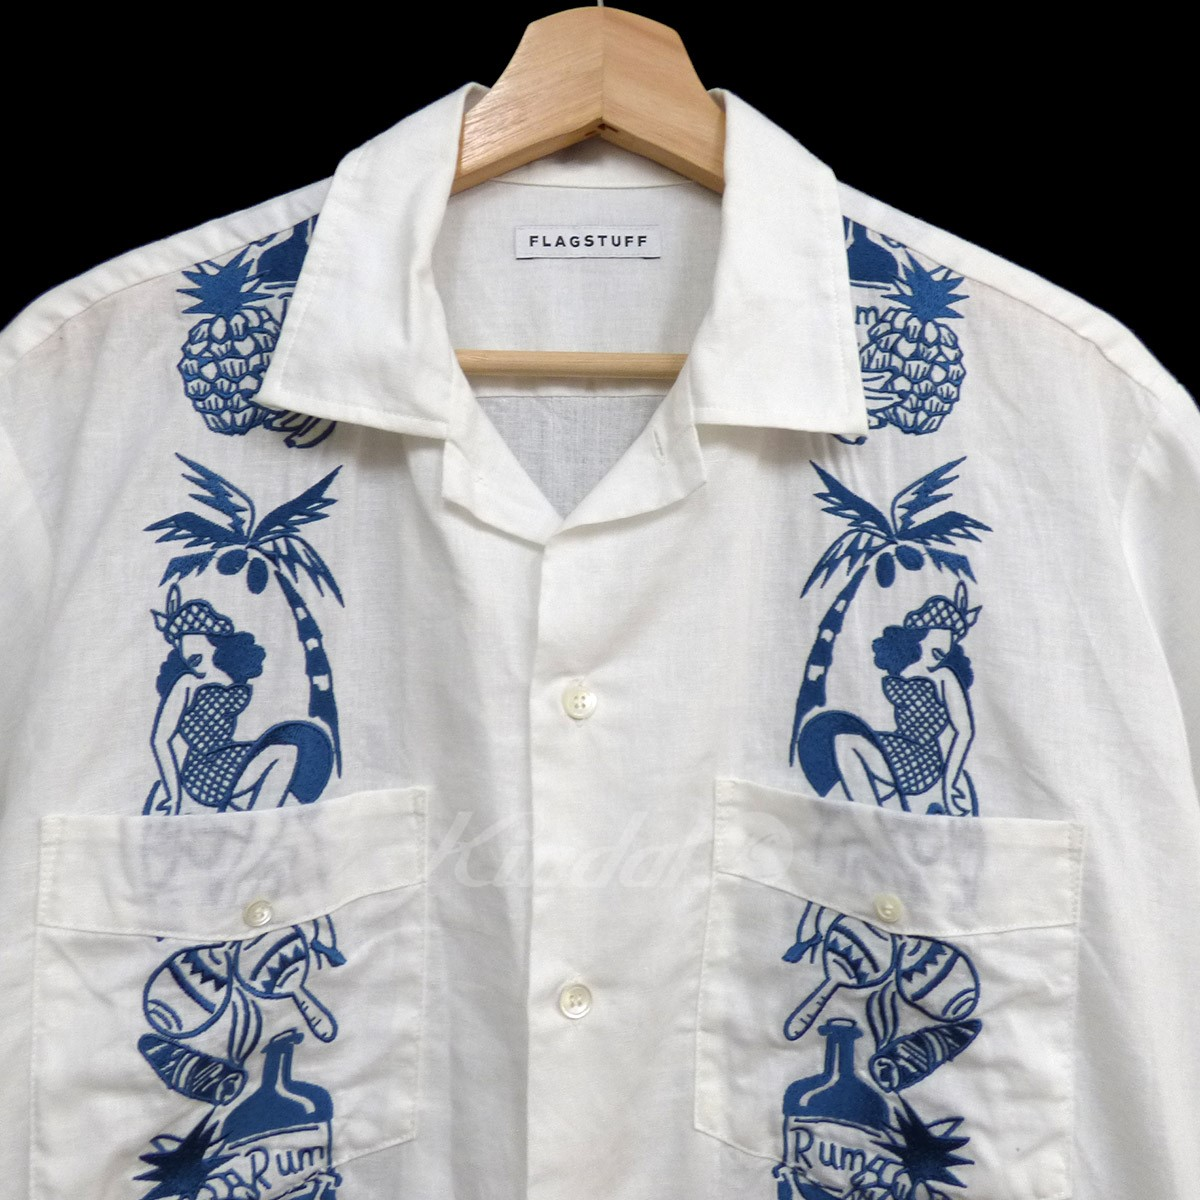 Kindal Flagstuff X Masa 17ss Scoulp Cuba Shirts Aloha Bowling